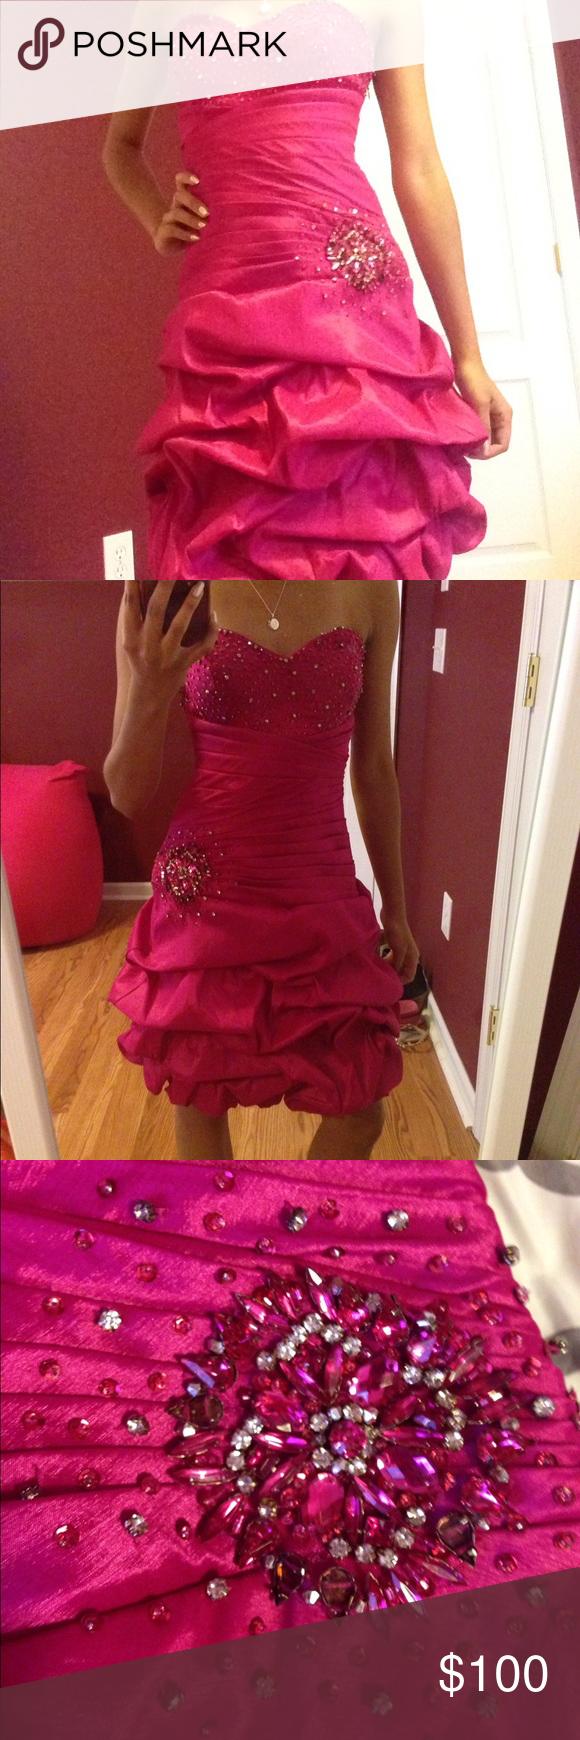 Pink mermaid style prom dress